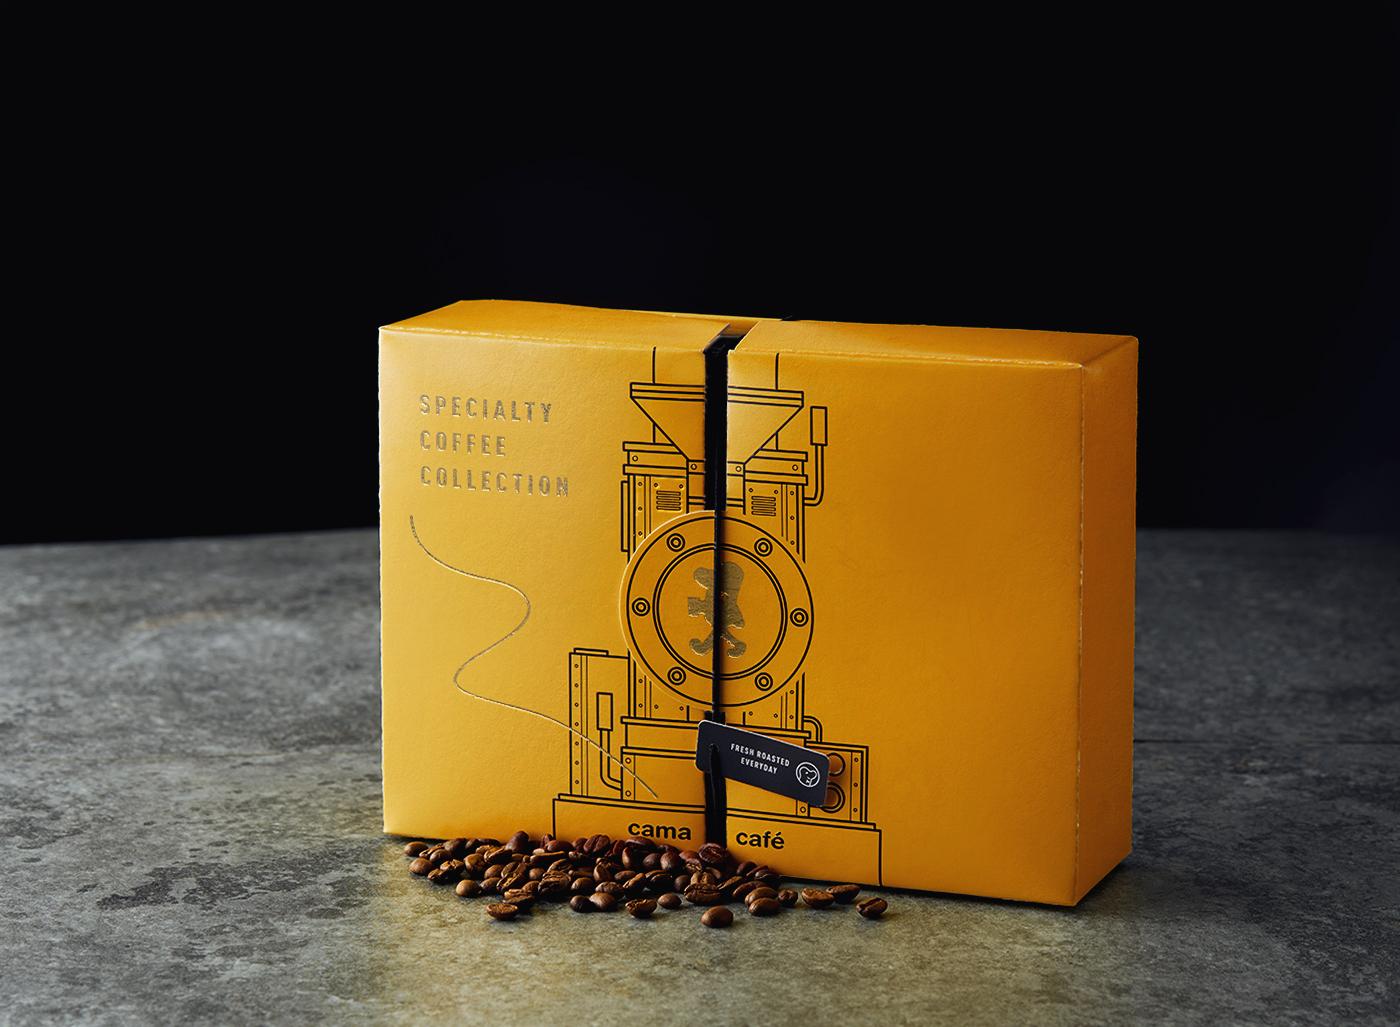 Cama Café Specialty Coffee Collection Packaging Design